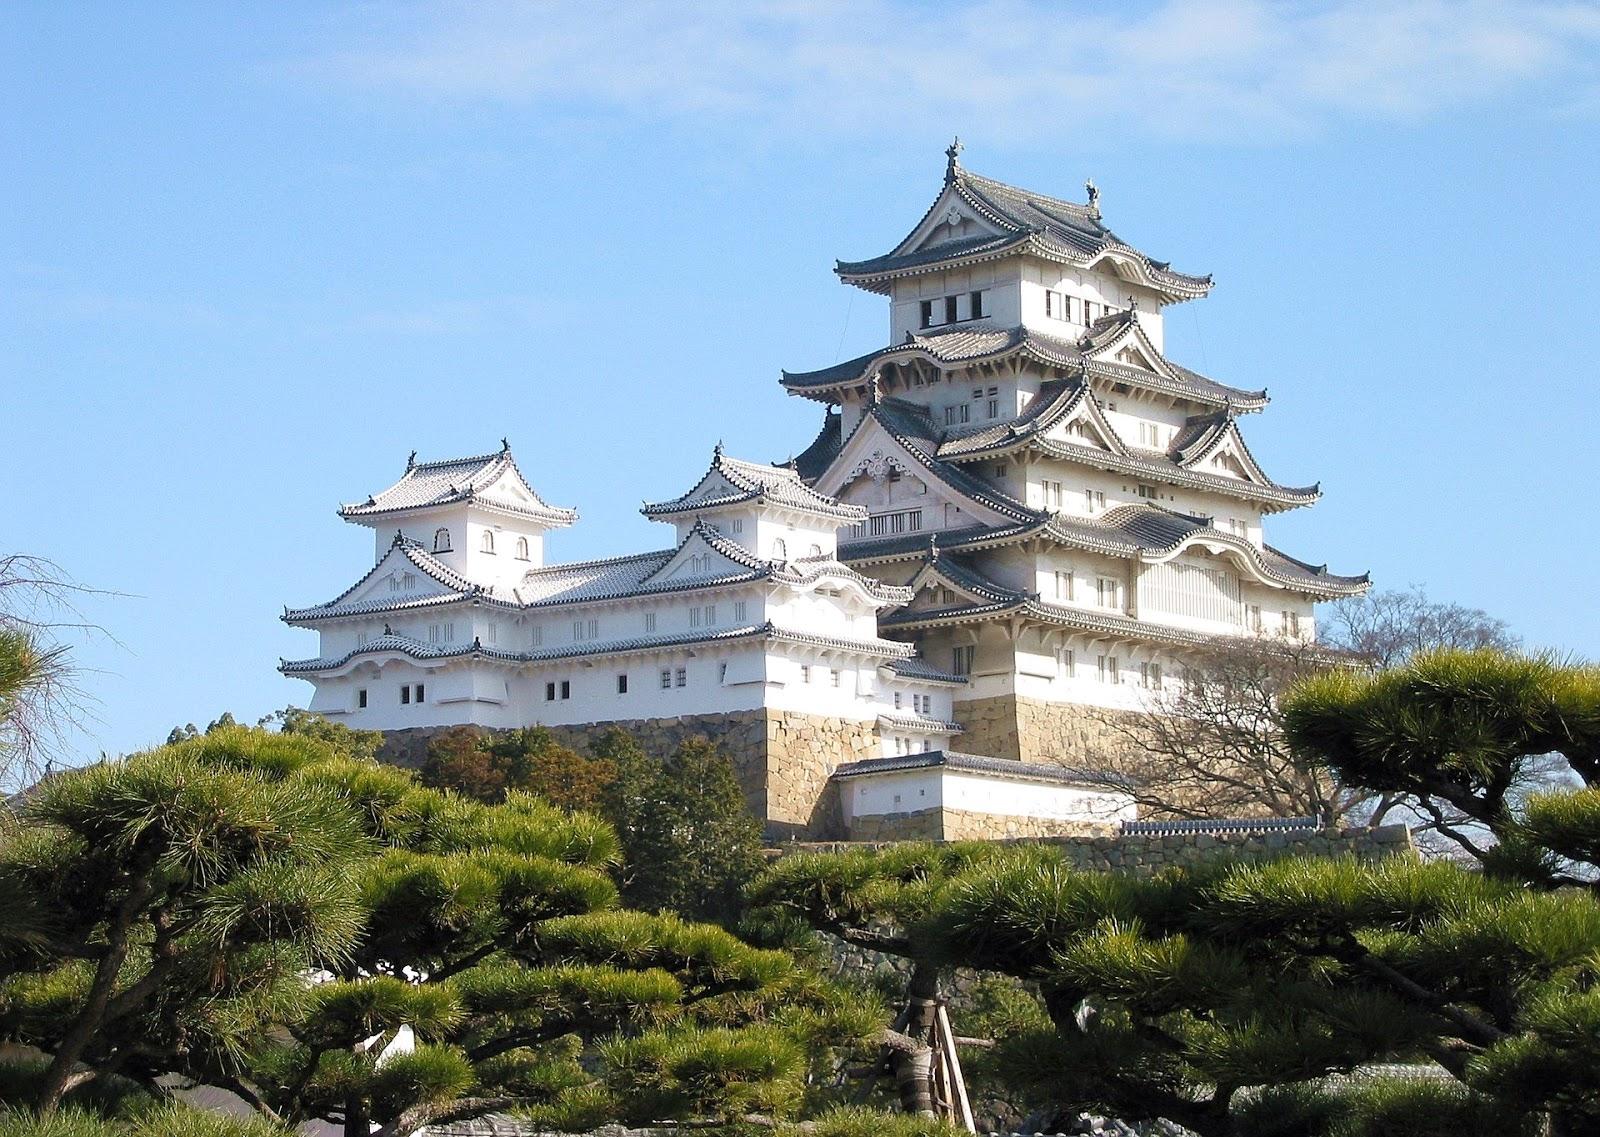 神戶-景點-推薦-姬路城-Himeji Castle-自由行-旅遊-觀光-必遊-必去-必玩-日本-kobe-tourist-attraction-travel